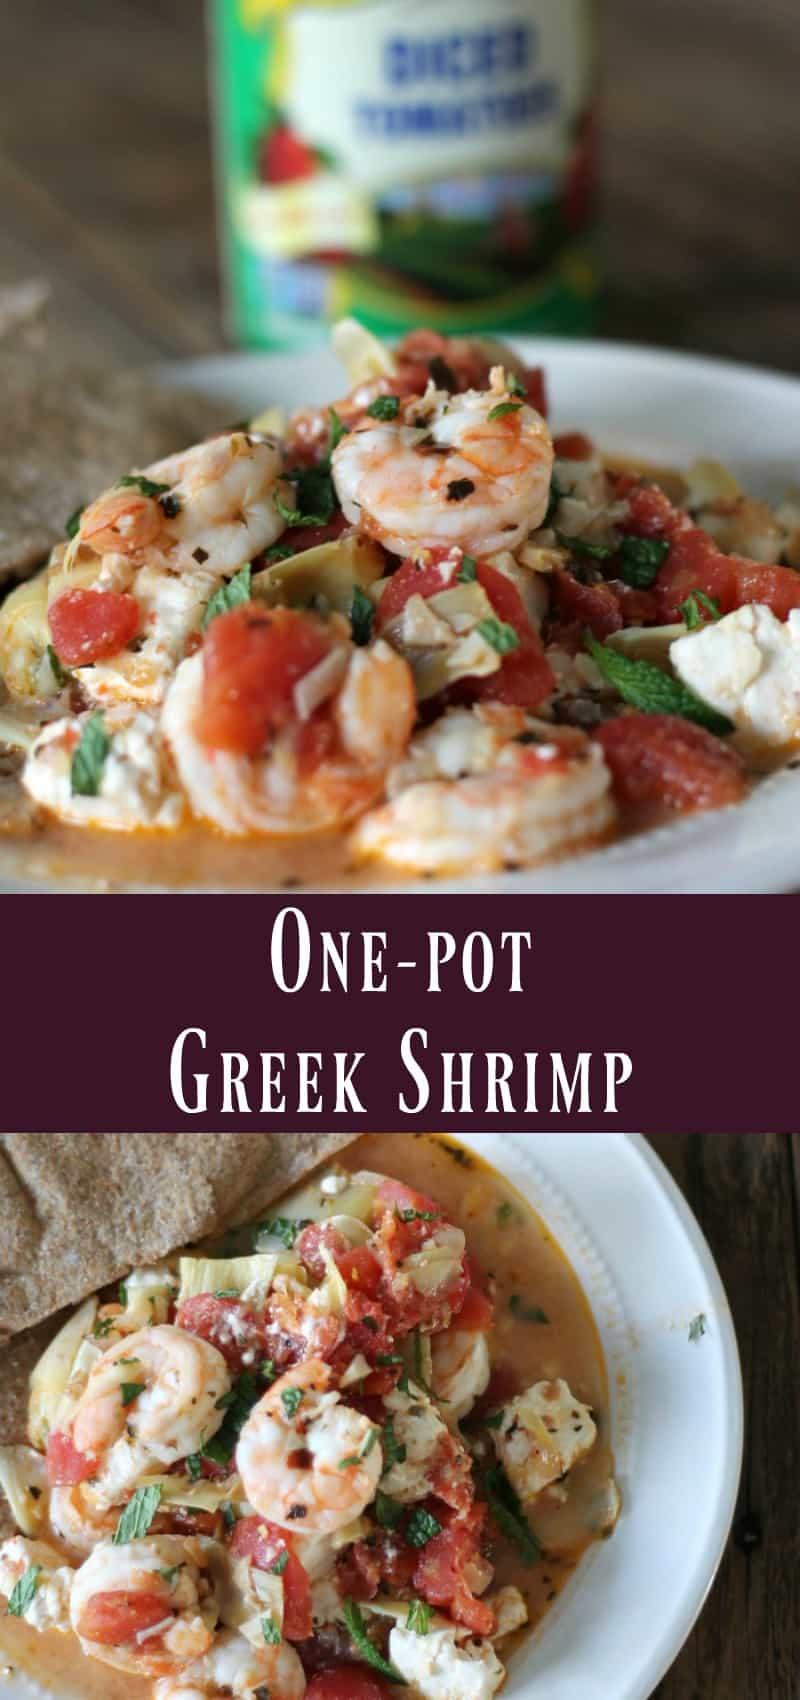 Healthy One-pot Greek Shrimp pantry meal recipe